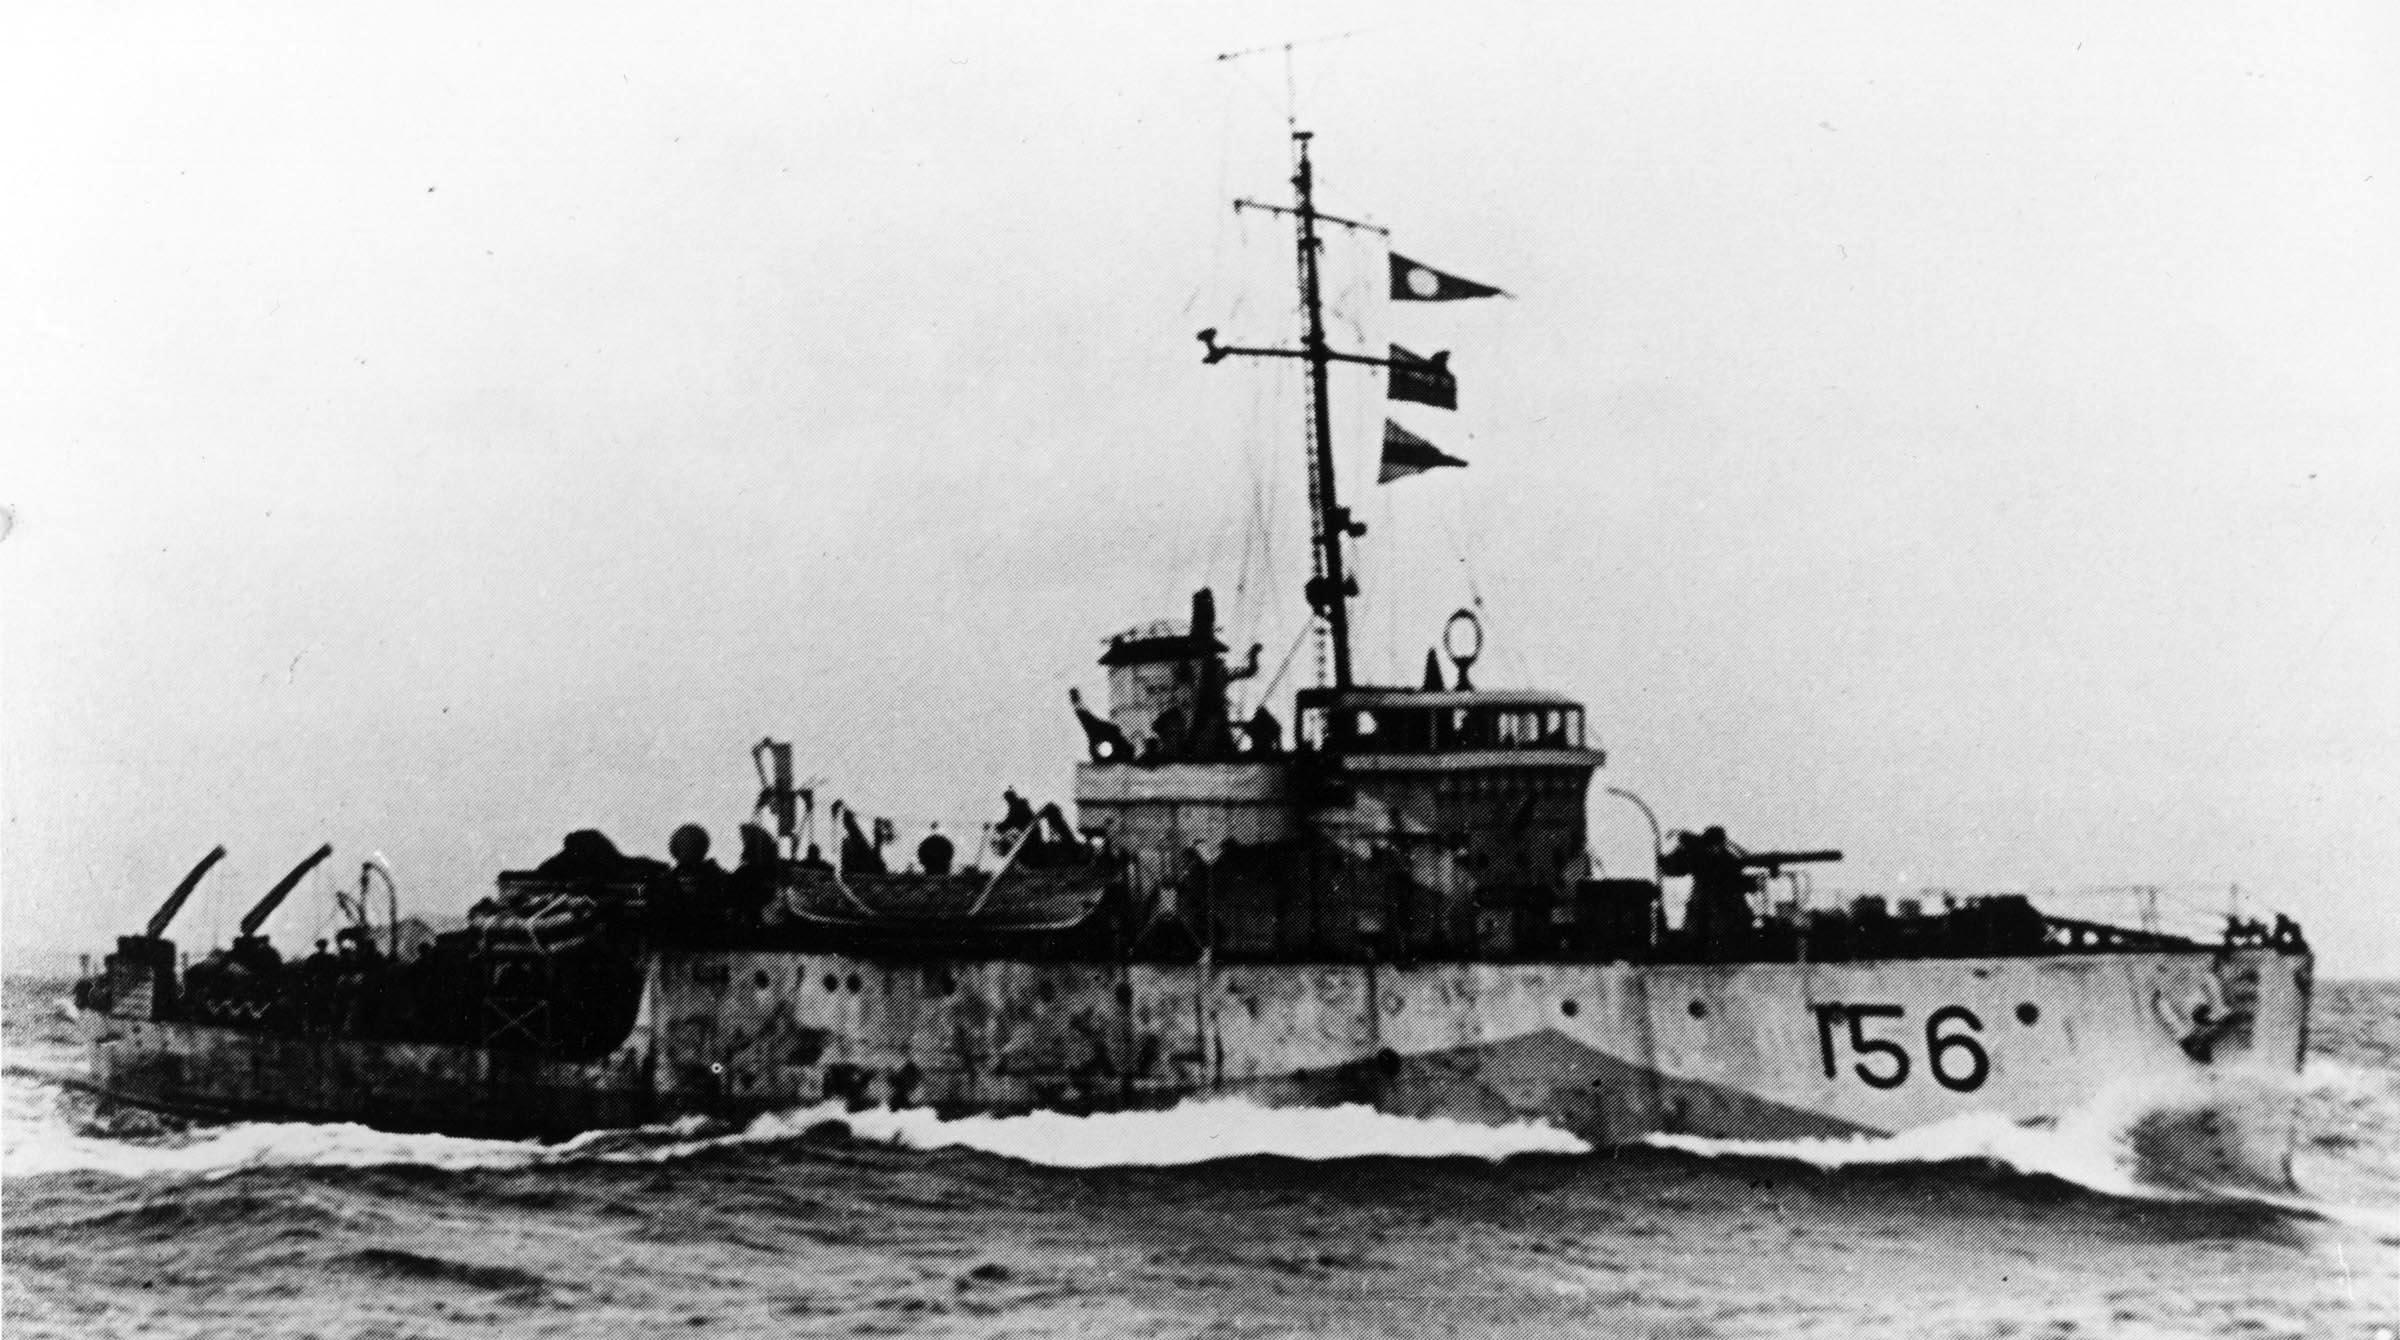 HMCS THUNDER (1st)